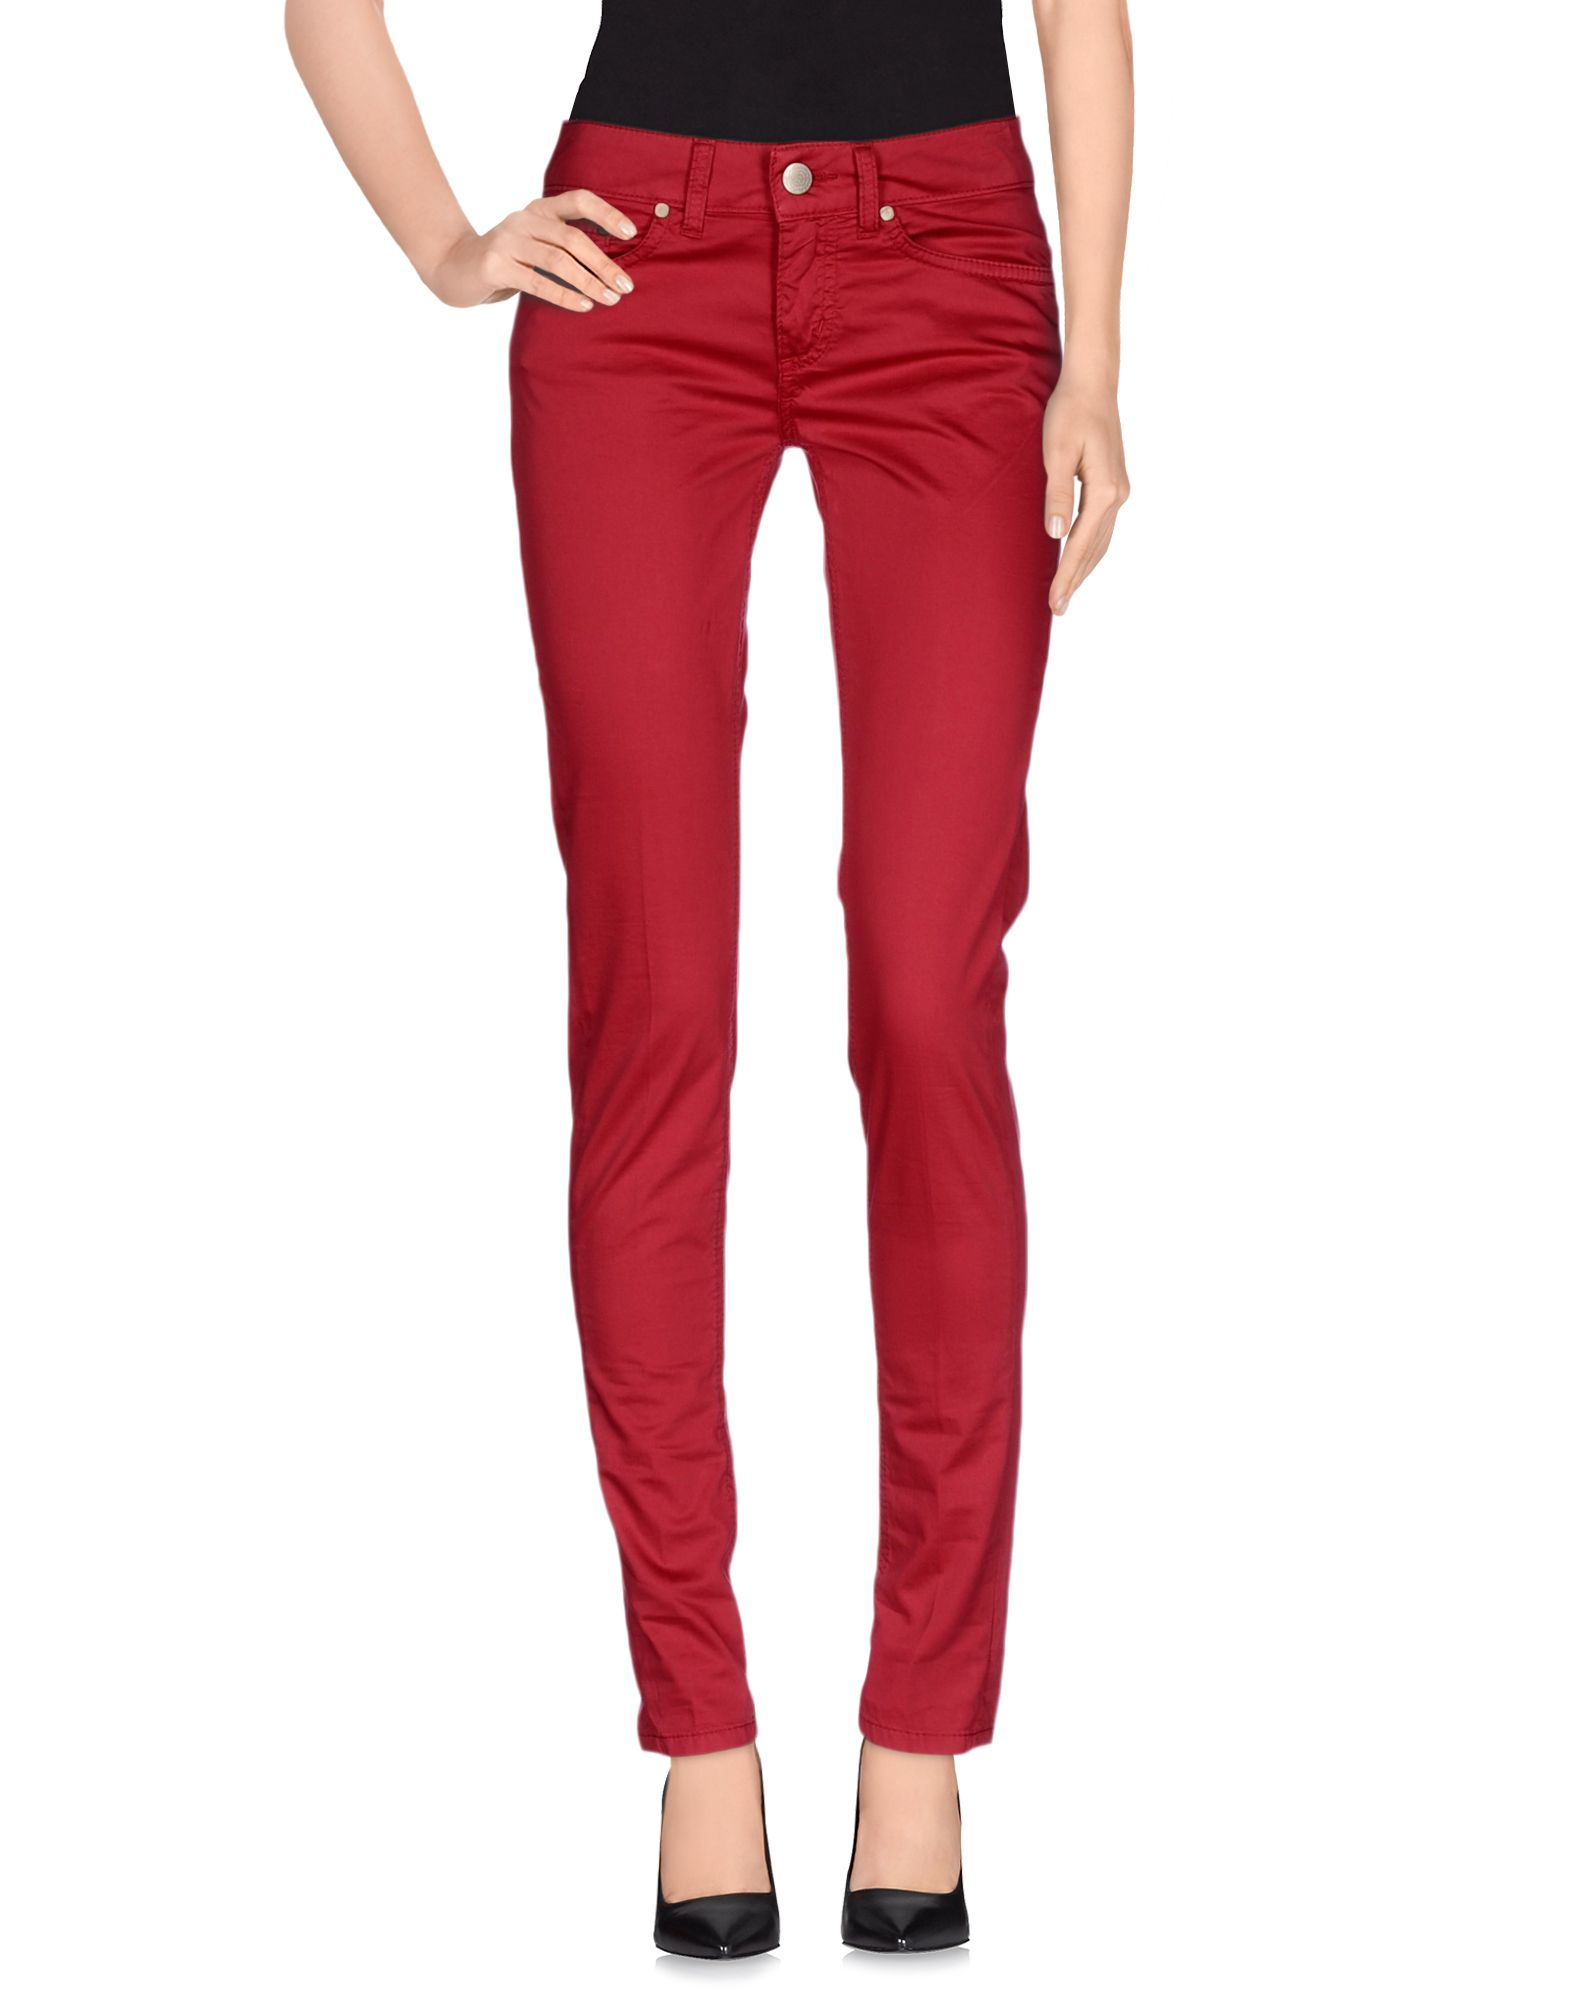 Pantalone Dondup Donna - Acquista online su w9HXY33